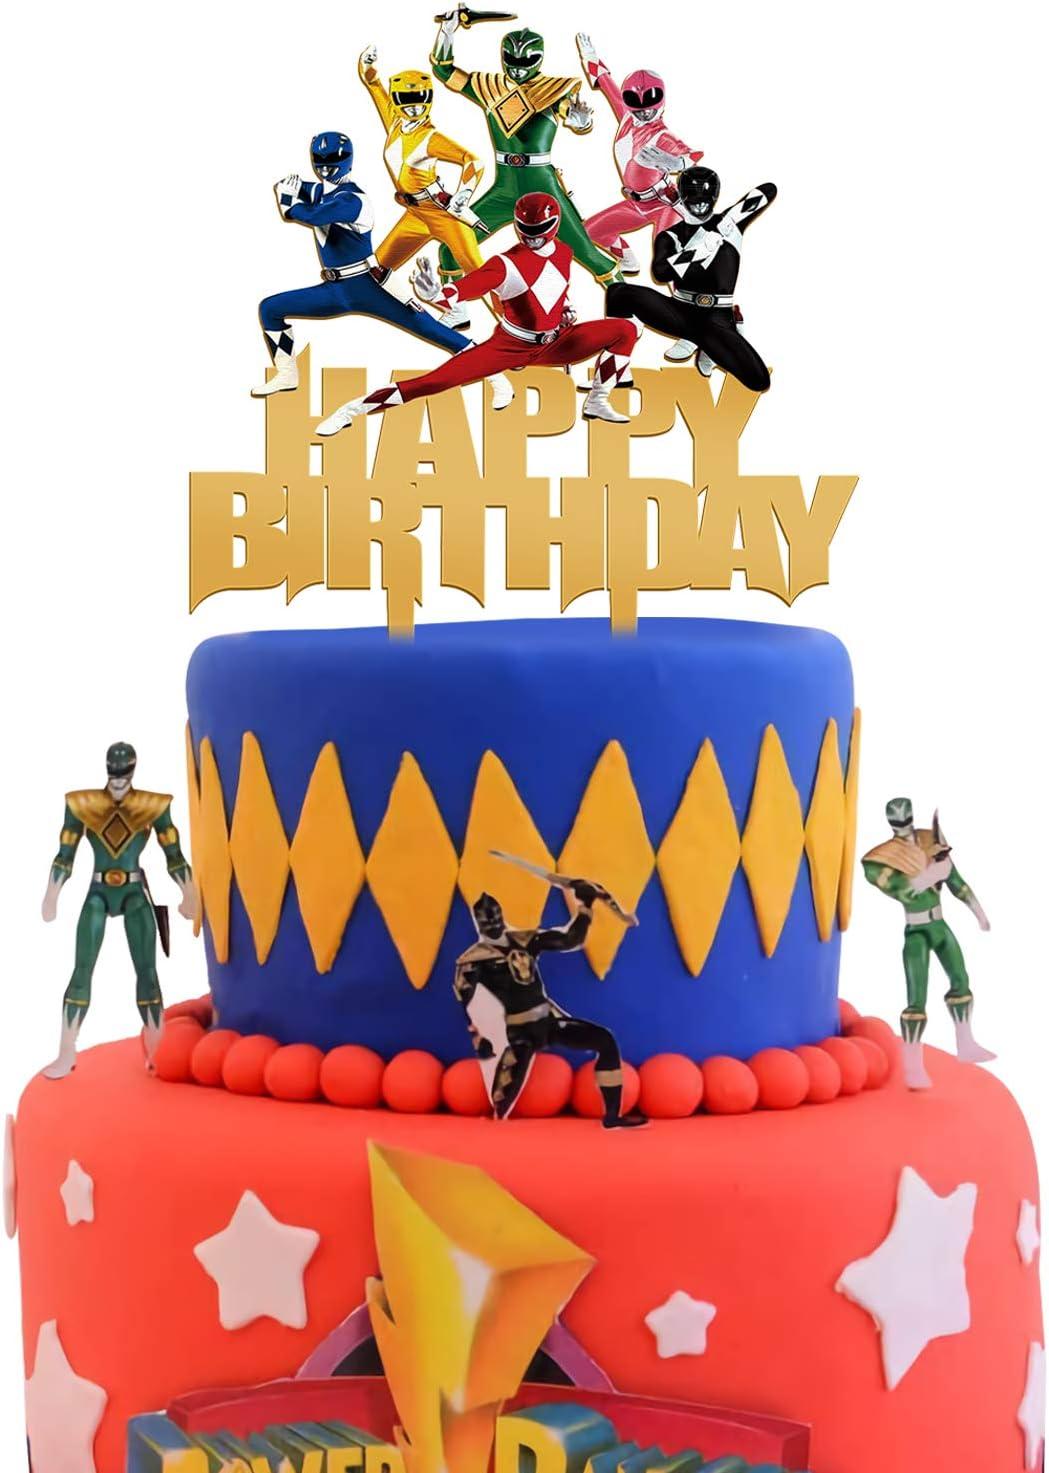 Amazon Com Acrylic Power Rangers Happy Birthday Cake Topper Power Rangers Cake Topper Boys And Girls Birthday Party Supplies Superhero Themed Party Favor Toys Games